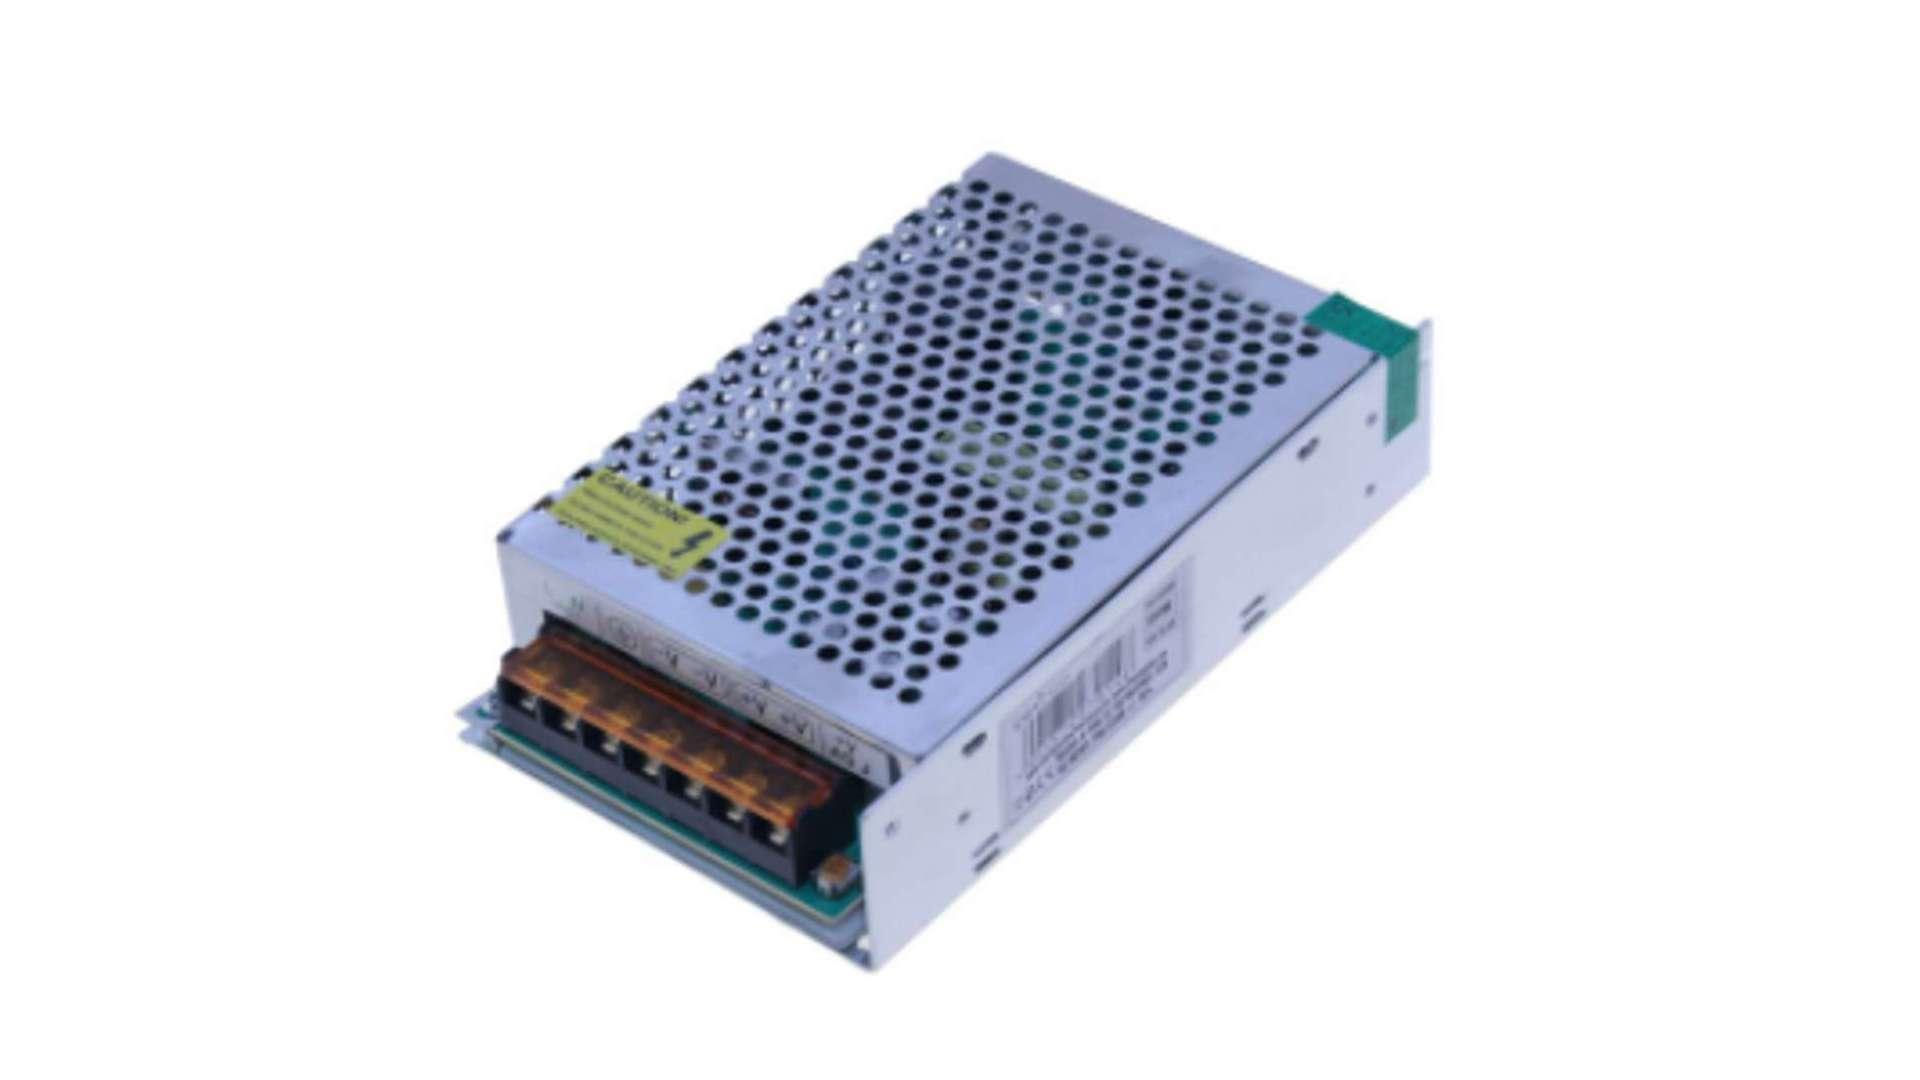 12V 36W IP20 enclosed power supply